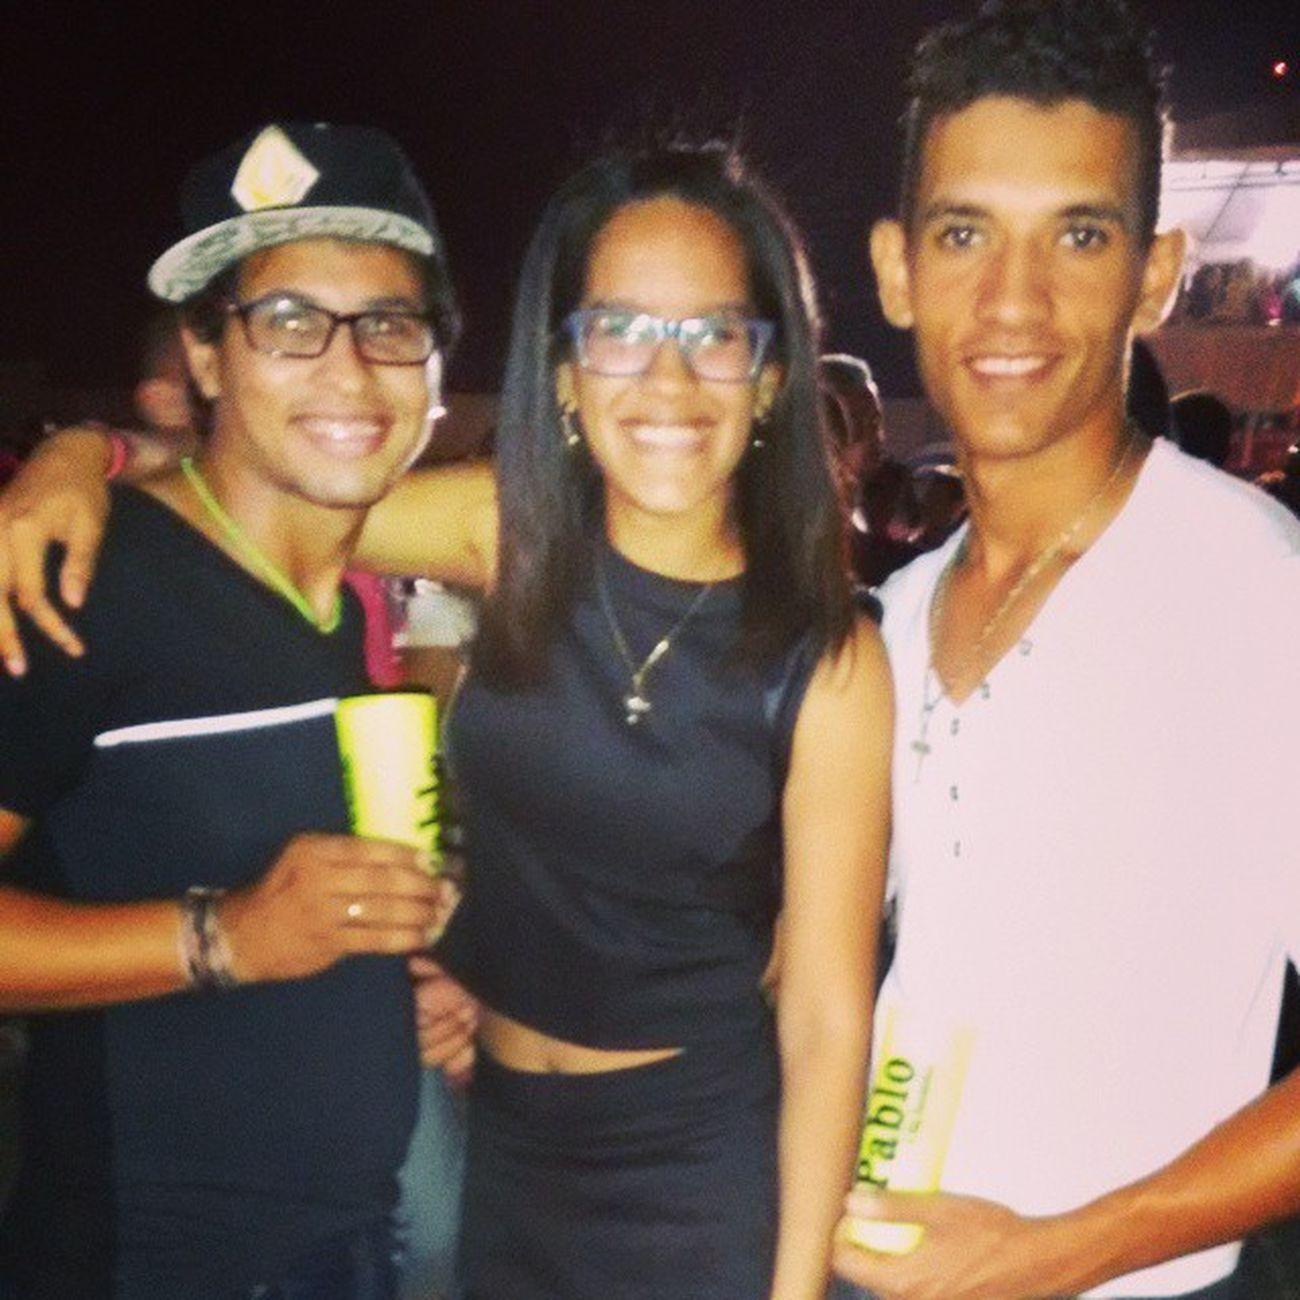 SobreOntemPablo FestaToop ExporSal2014 ComOsLiindos ?????